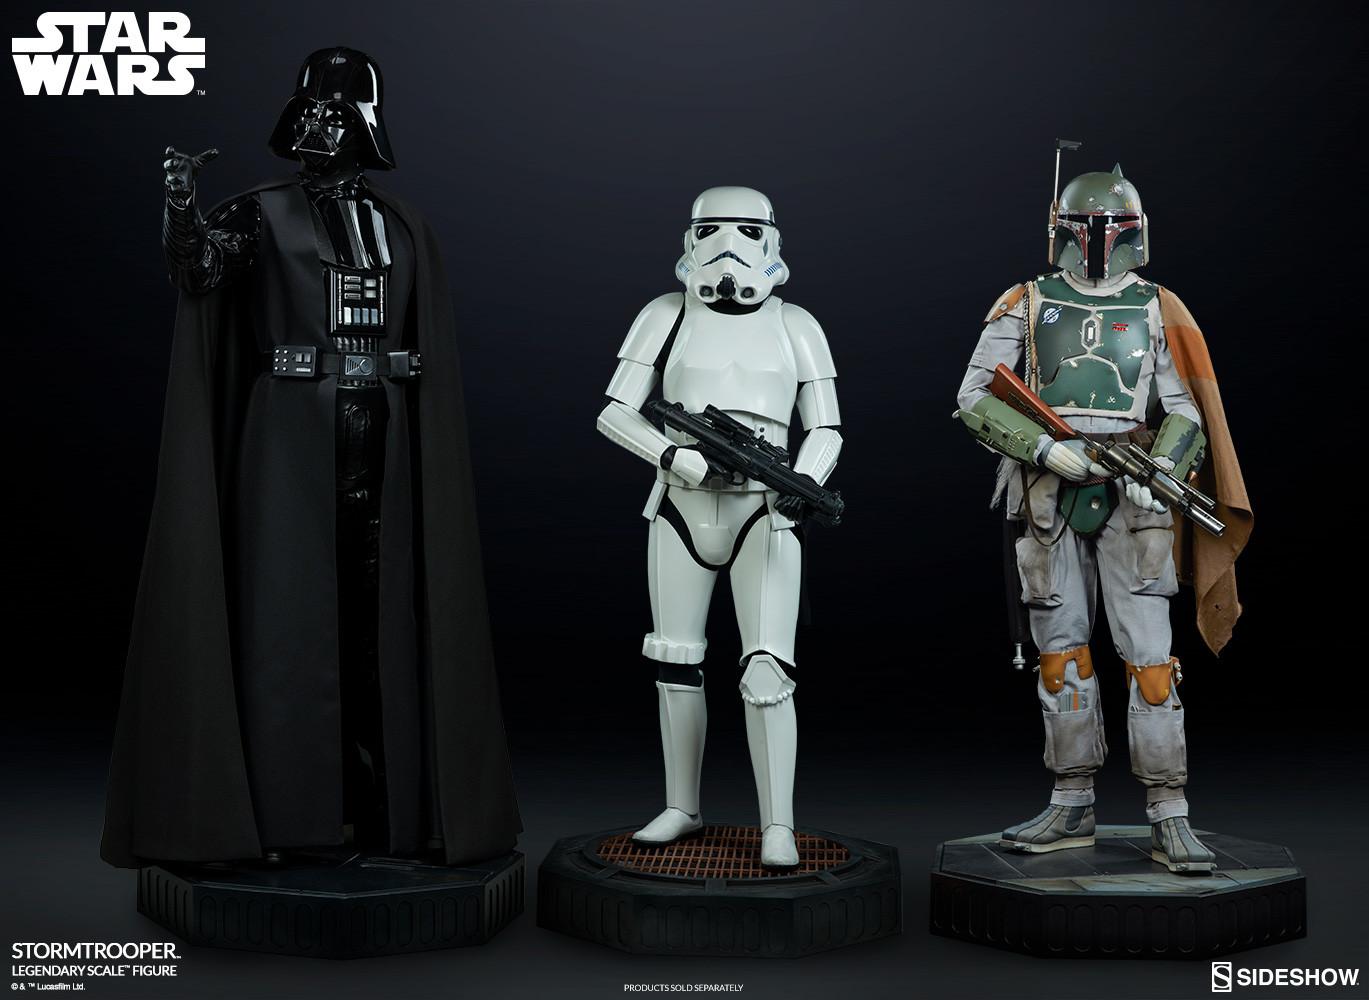 pio-paulo-santana-star-wars-stormtrooper-legendary-scale-figure-sideshow-400158-22.jpg